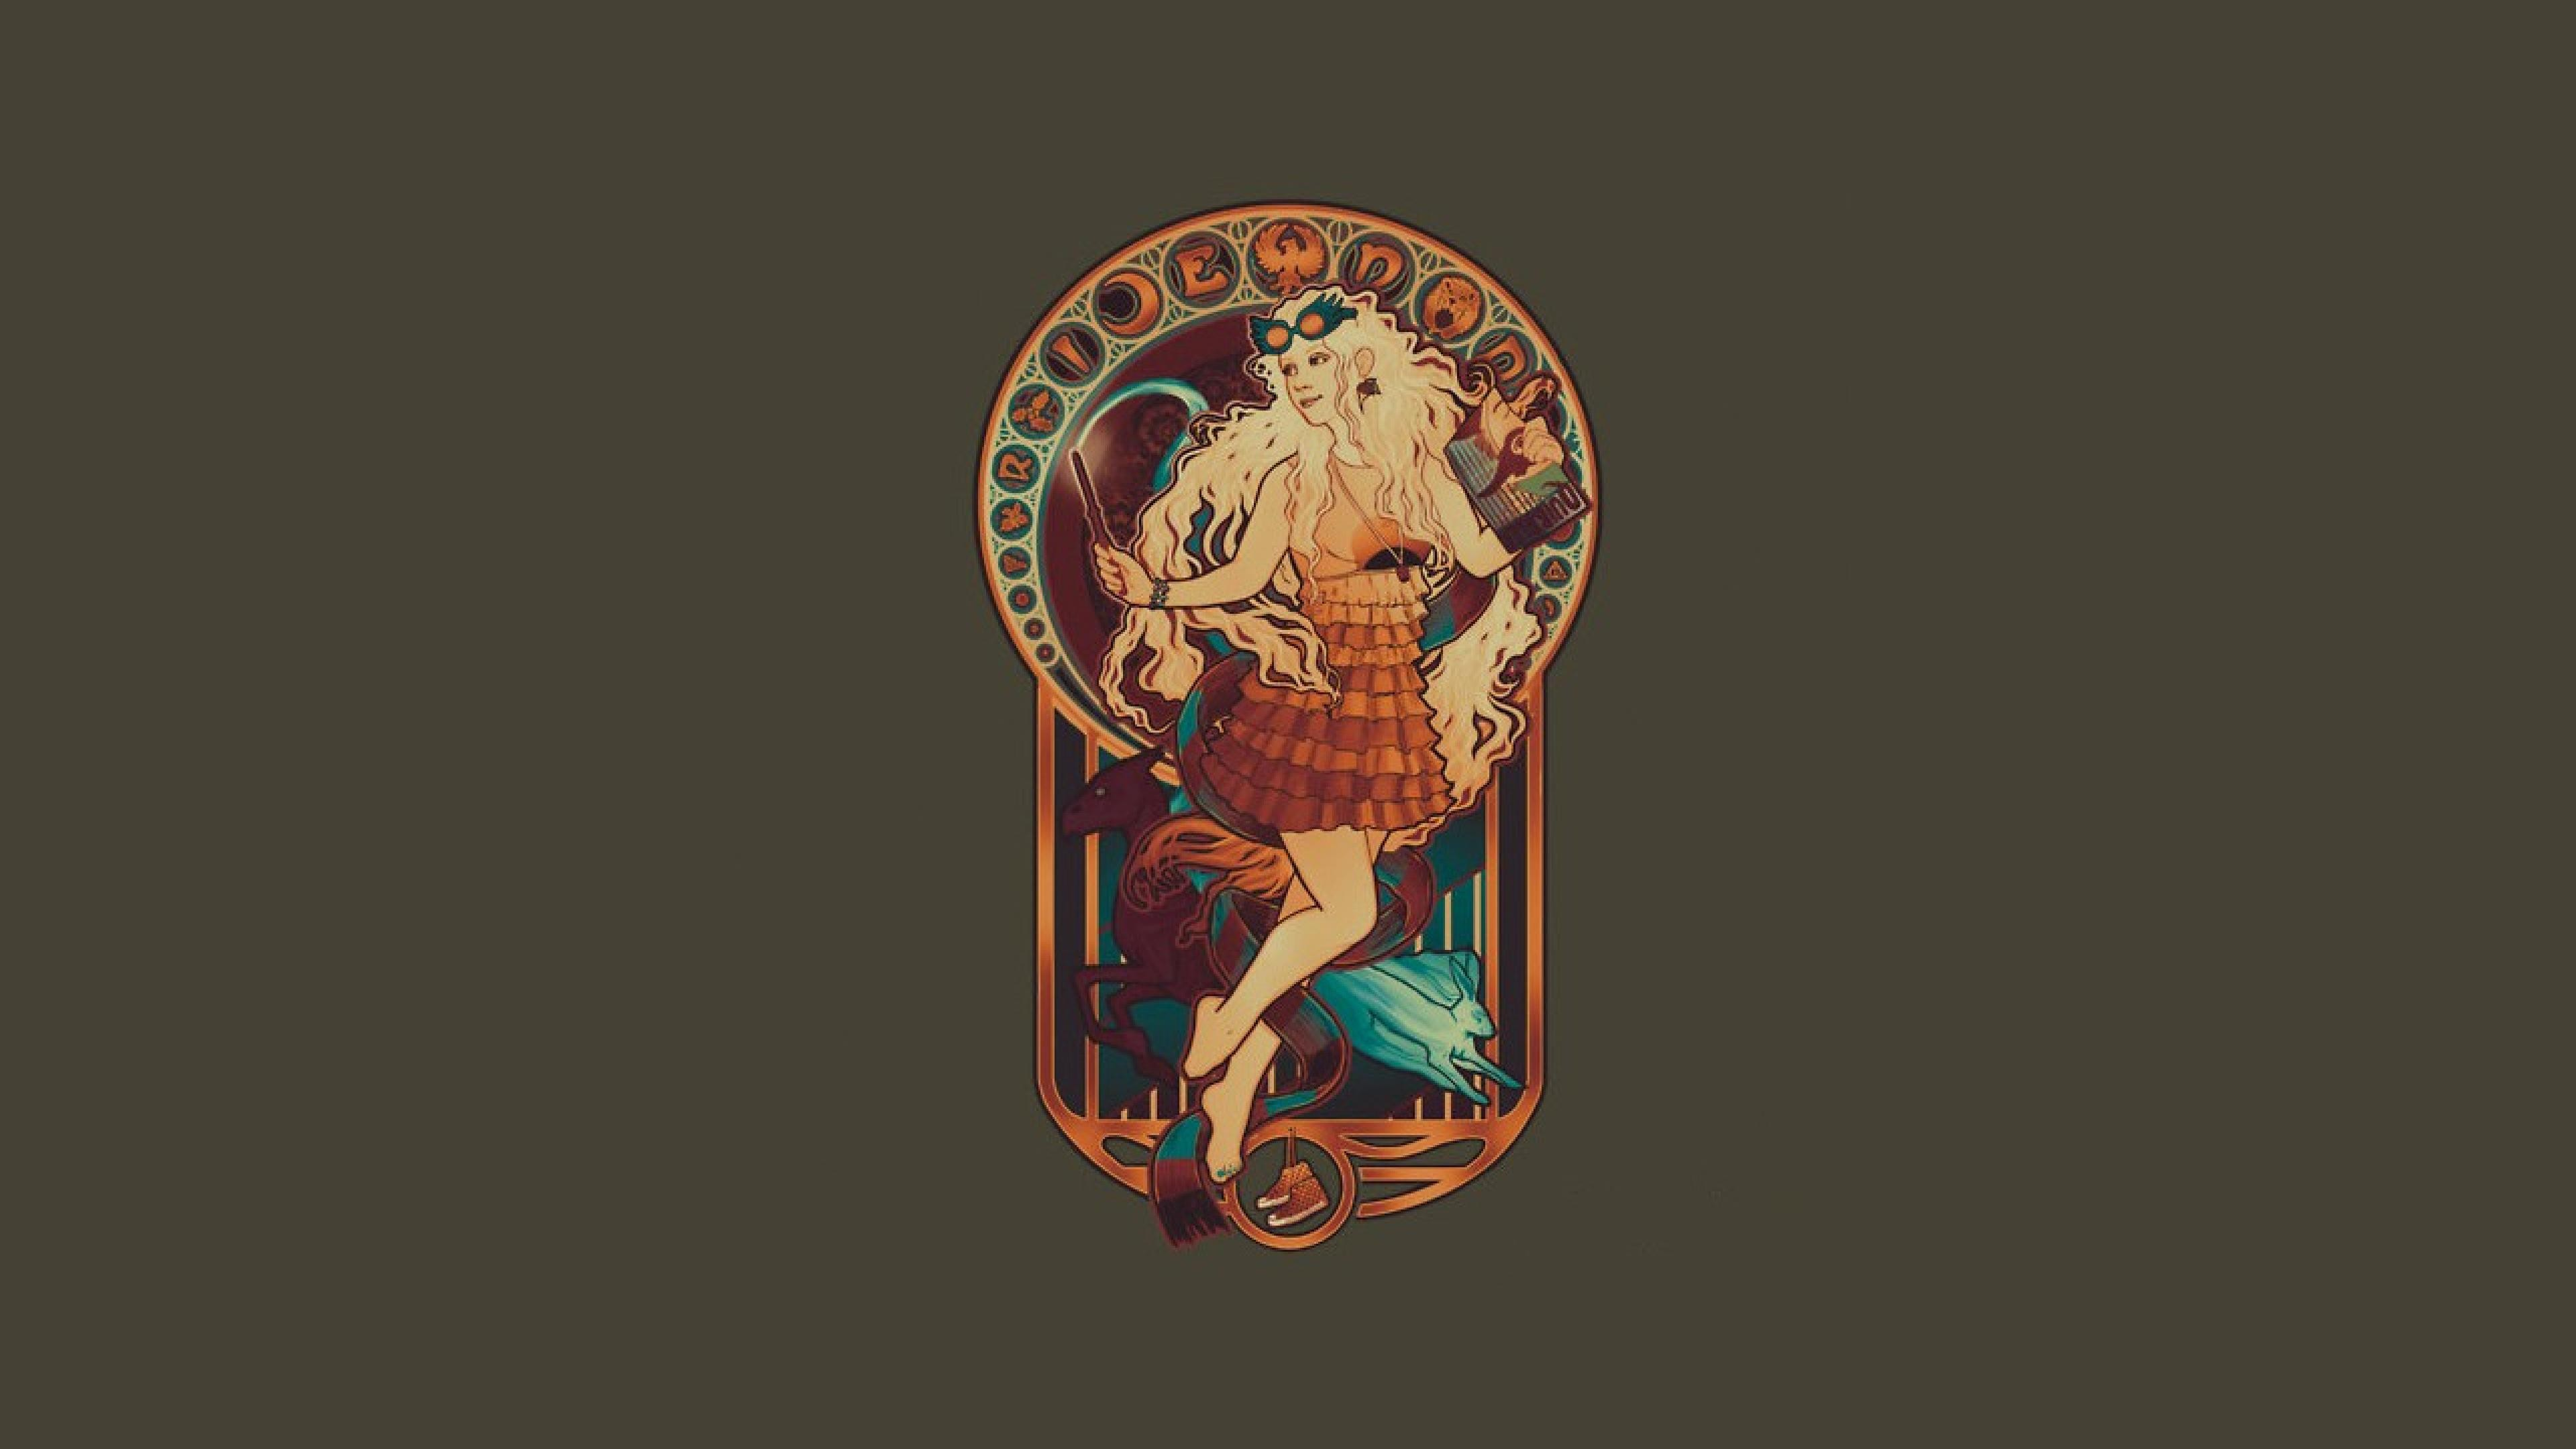 Free Download Harry Potter Luna Lovegood Art Nouveau Ultra